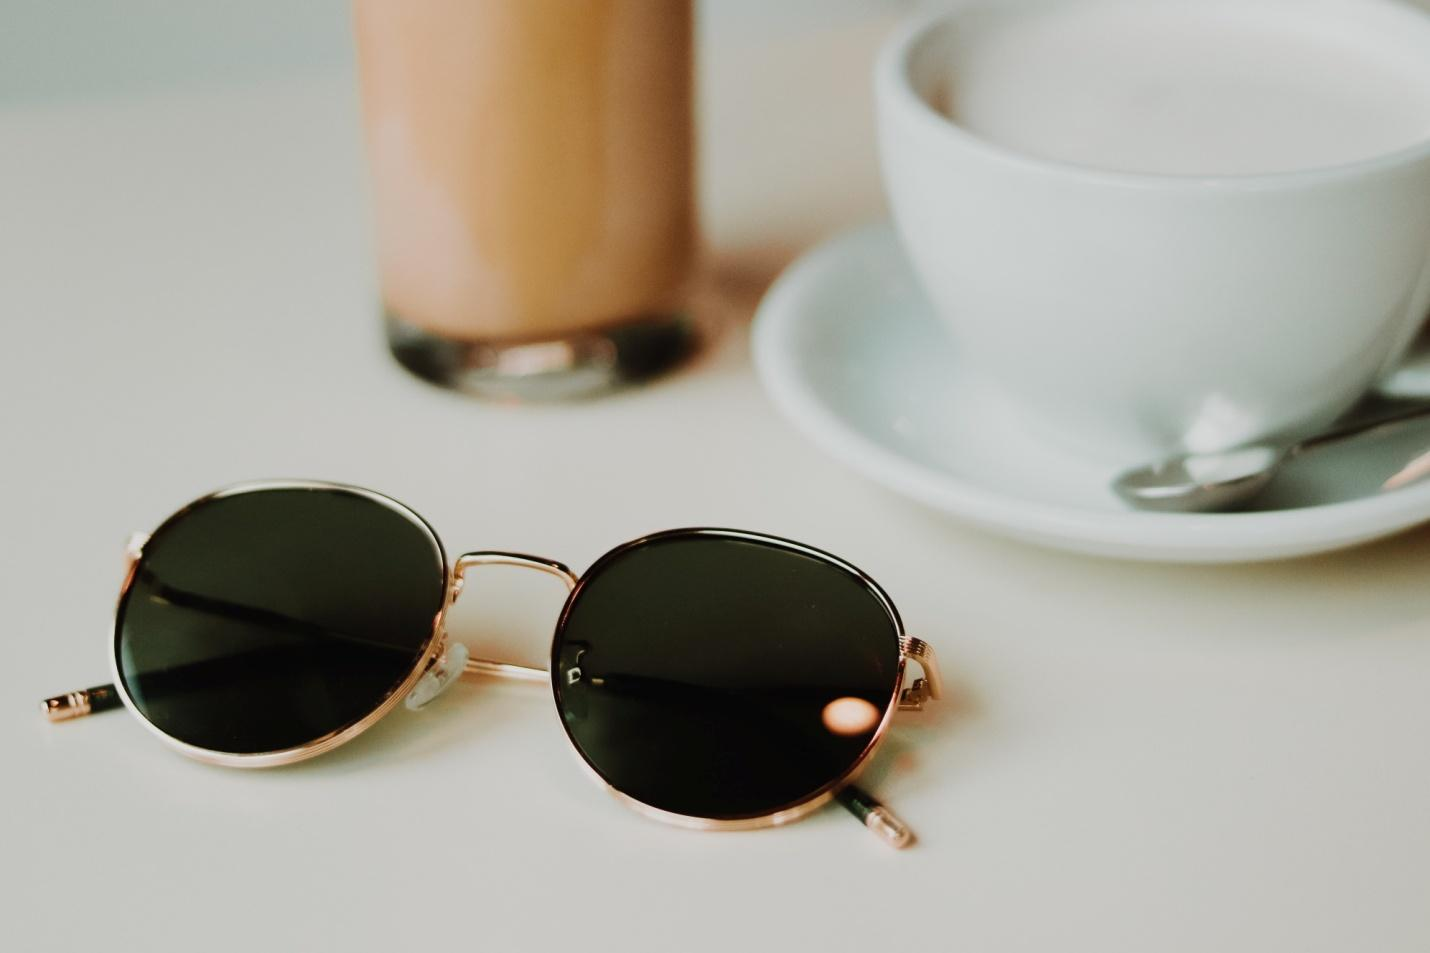 Sunglasses Trends 2021